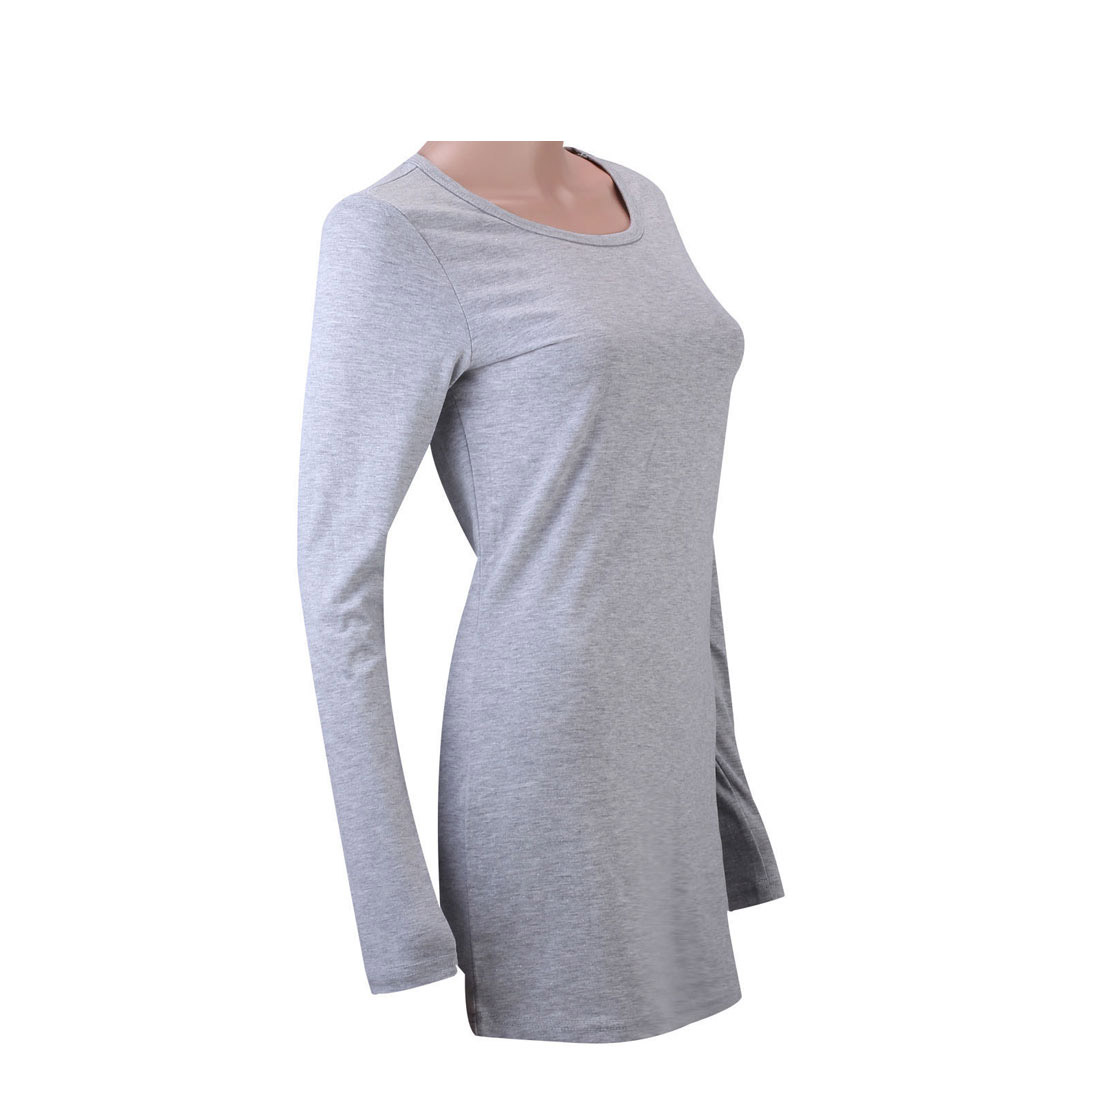 Women Cotton Basic Tee Long Sleeve V Neck Crew Neck Slim